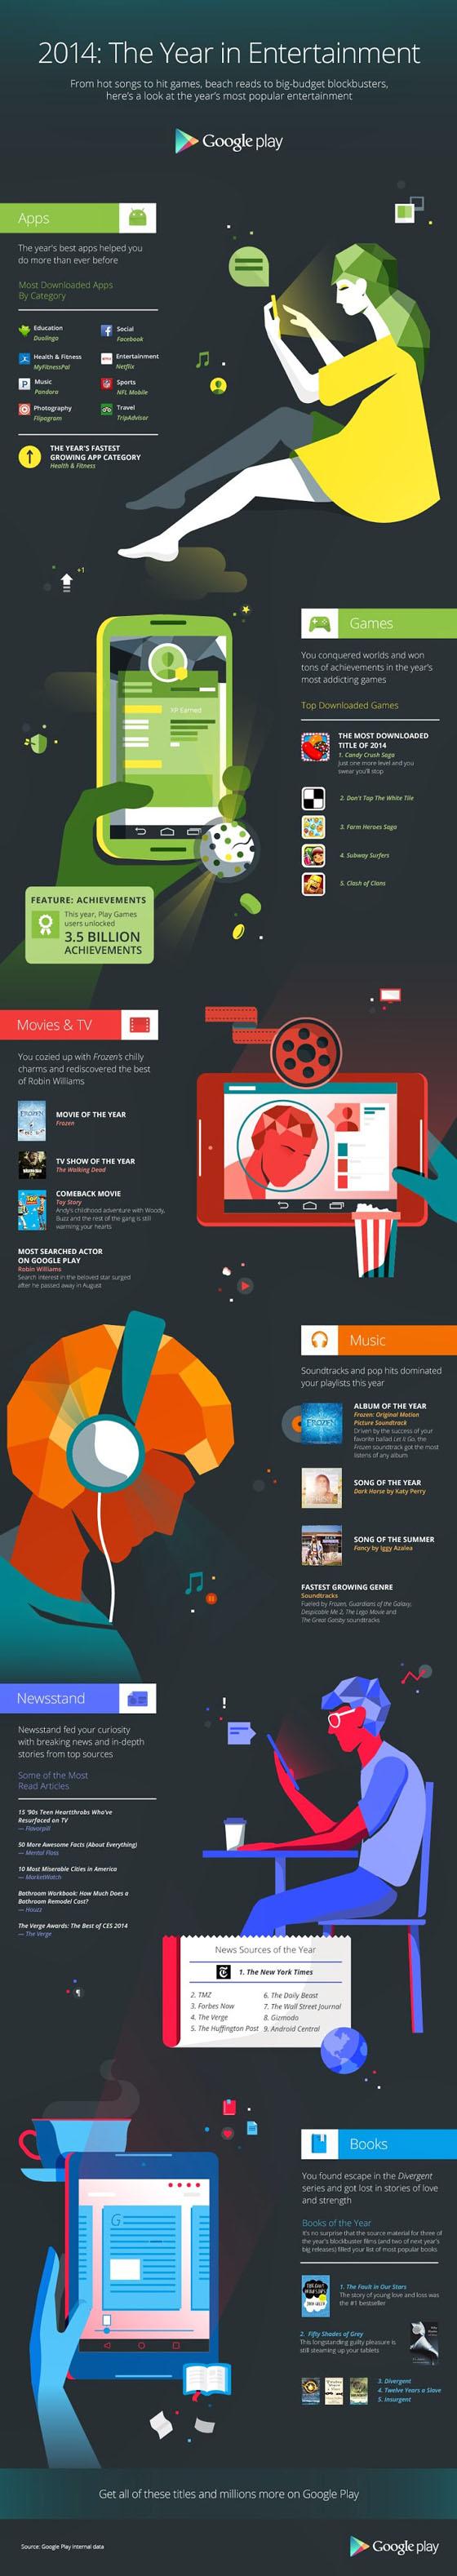 populairste Android-apps van 2014